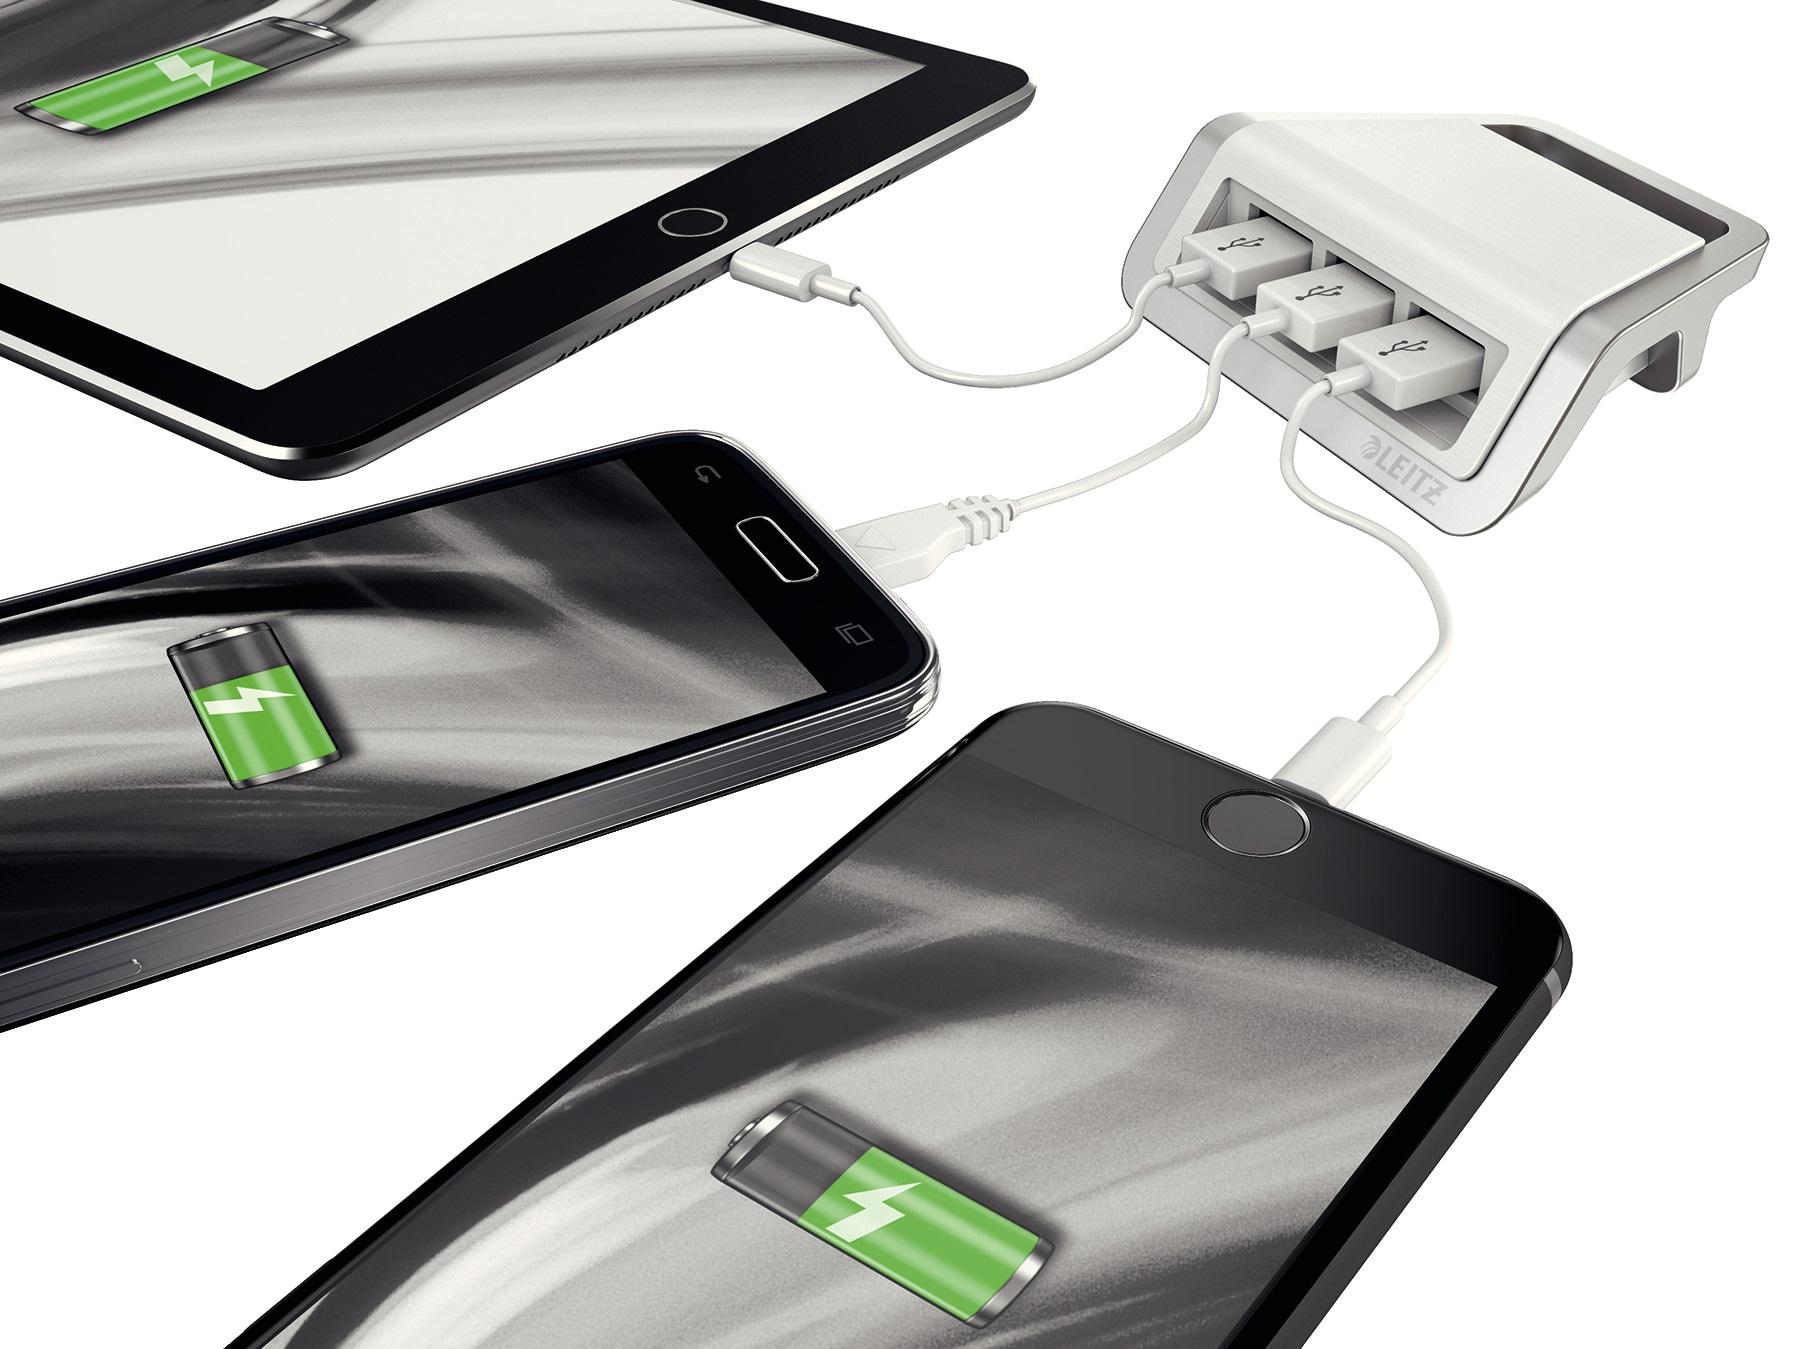 Descriere Incarcator cu trei porturi USB, alb arctic, Leitz Style